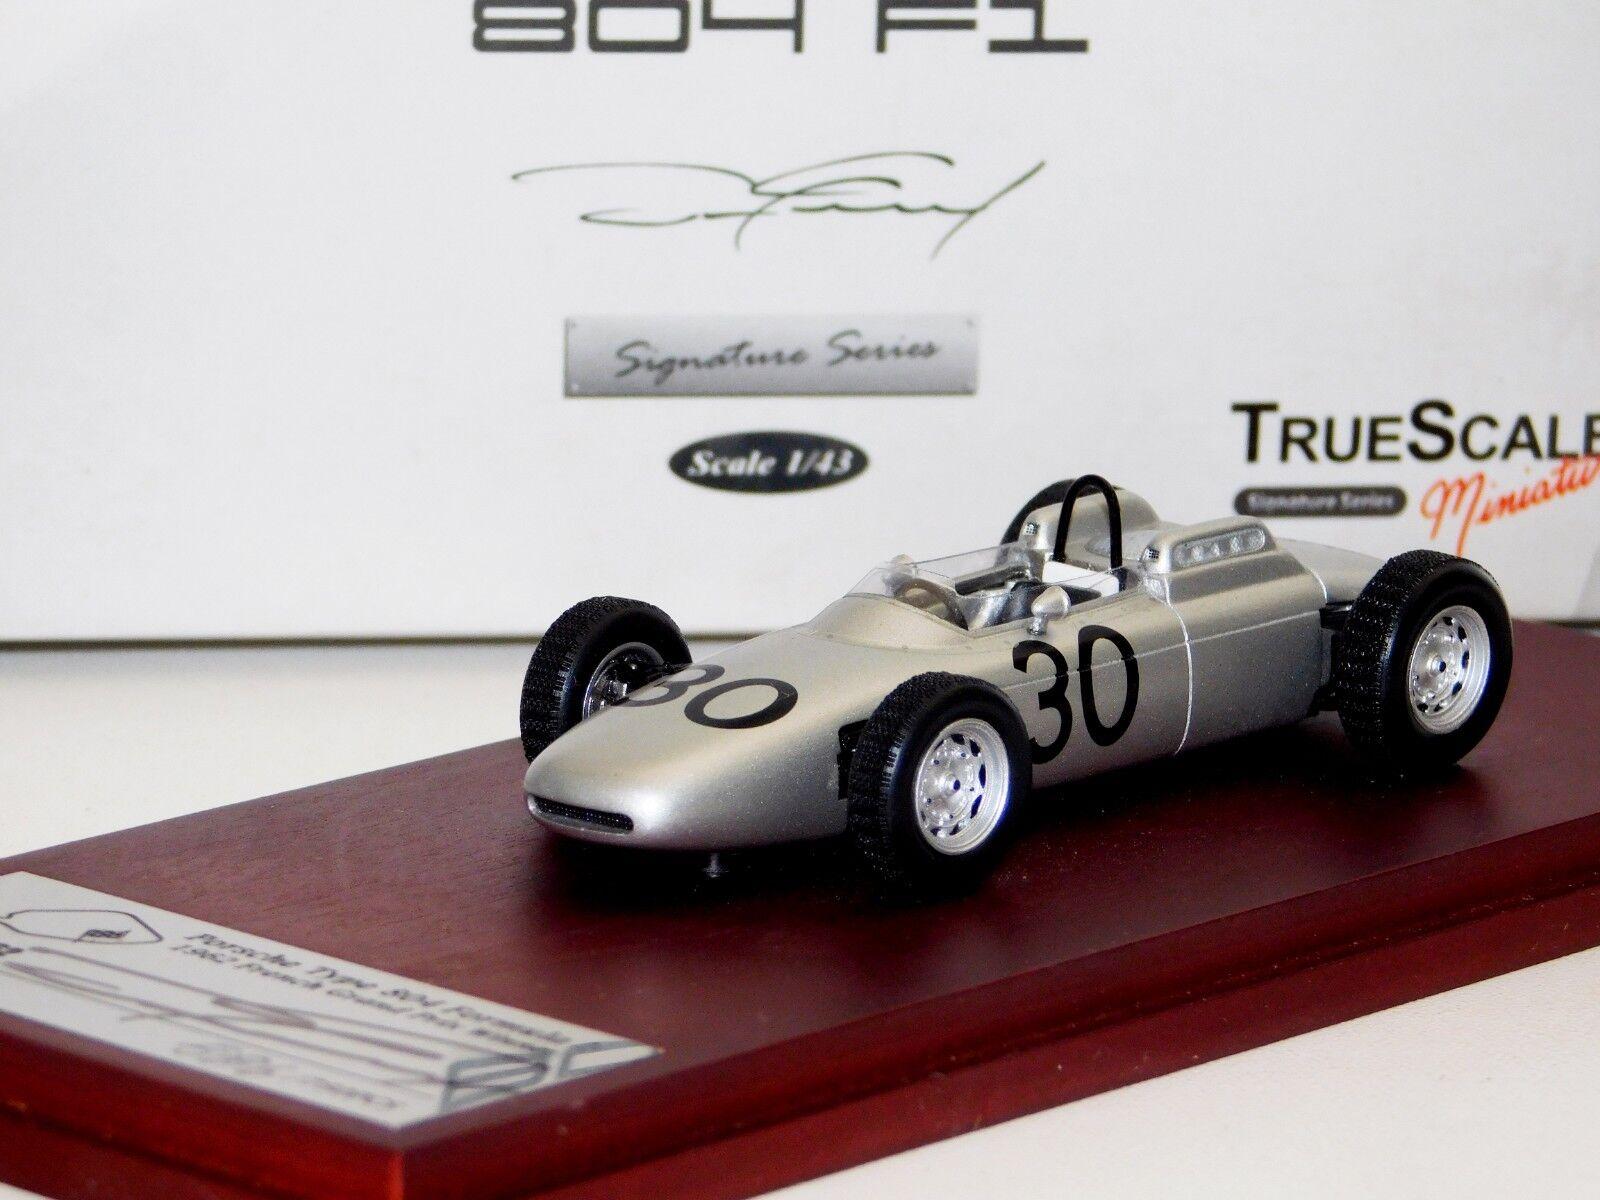 PORSCHE 804 F1  30 WINNER FRENCH GP 1962 SIGNED by GURNEY LIM. TRUESCALE  1:43